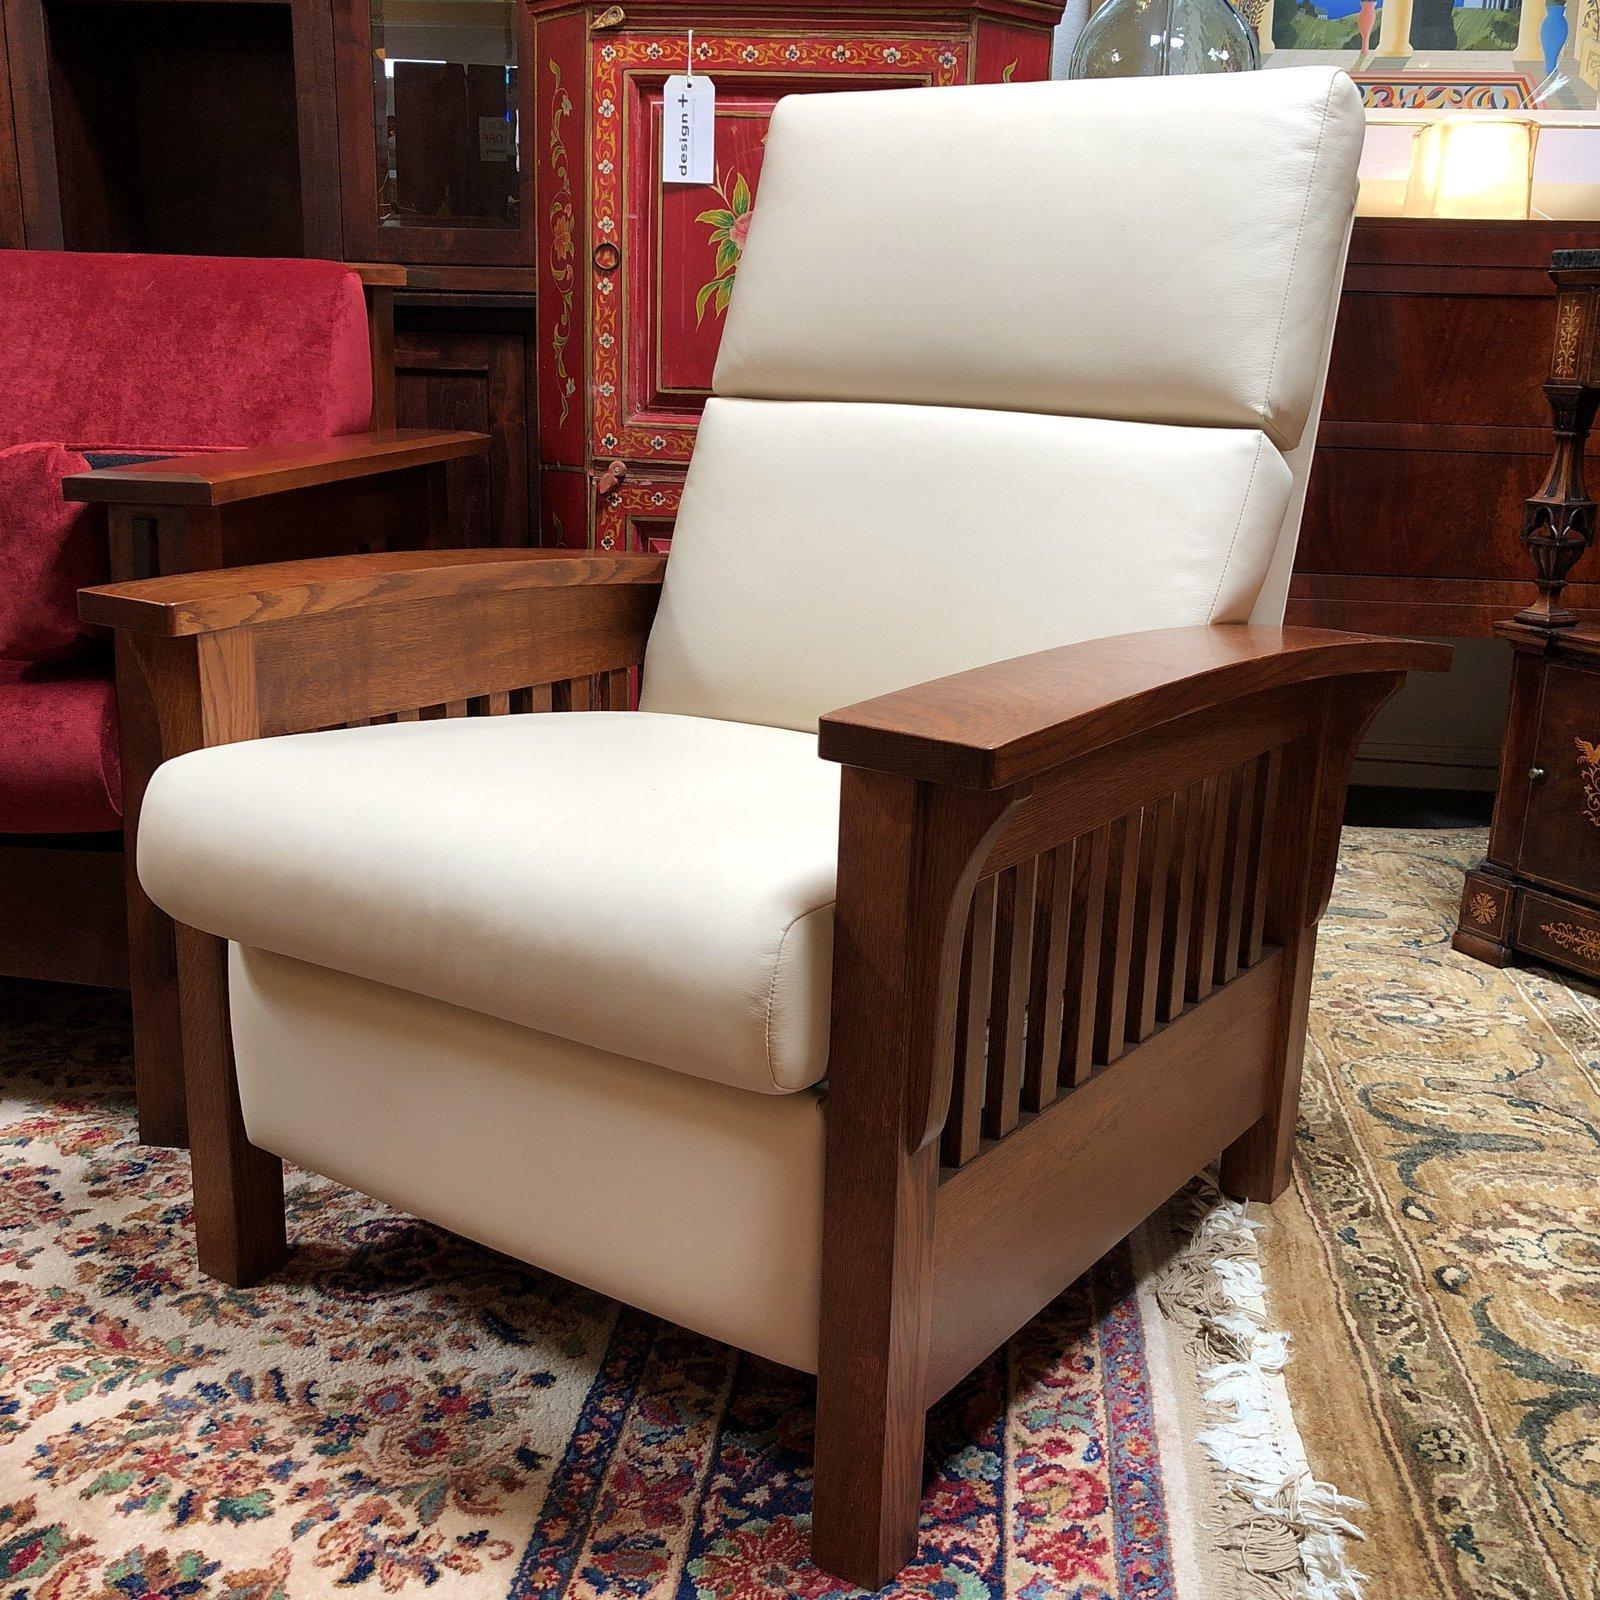 Superbe A Skyline Recliner By Aju0027 S Furniture. Straight From A Designer Showroom.  Aju0027s